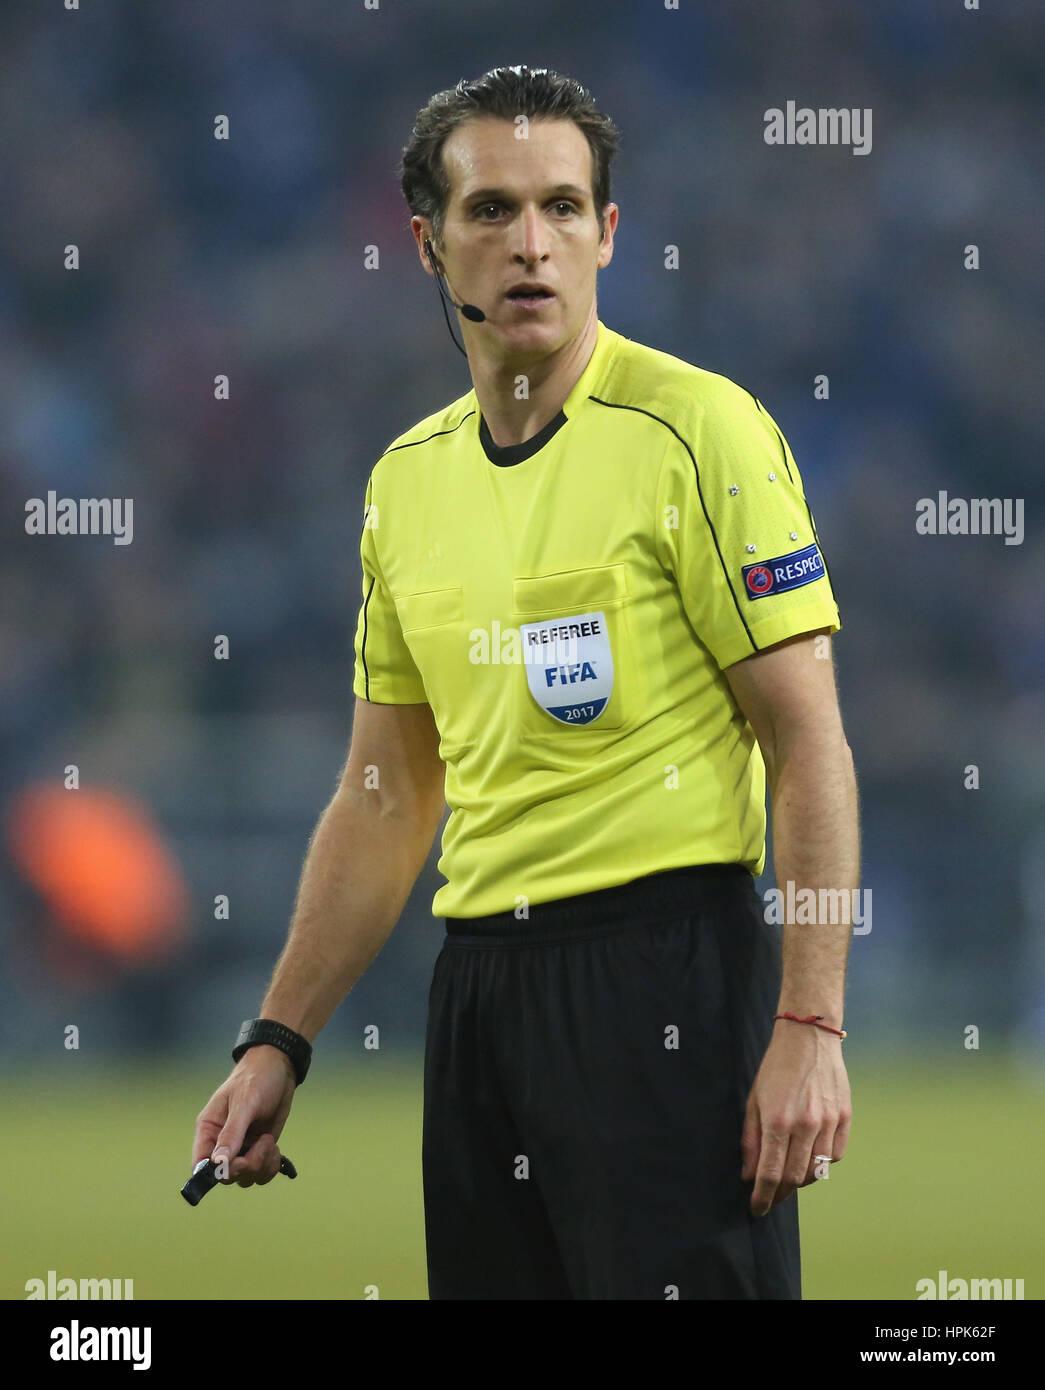 Gelsenkirchen, Germany 22.02.2017, FC Schalke 04 vs PAOK FC, Referee Luca Banti.                © Juergen Schwarz/Alamy - Stock Image